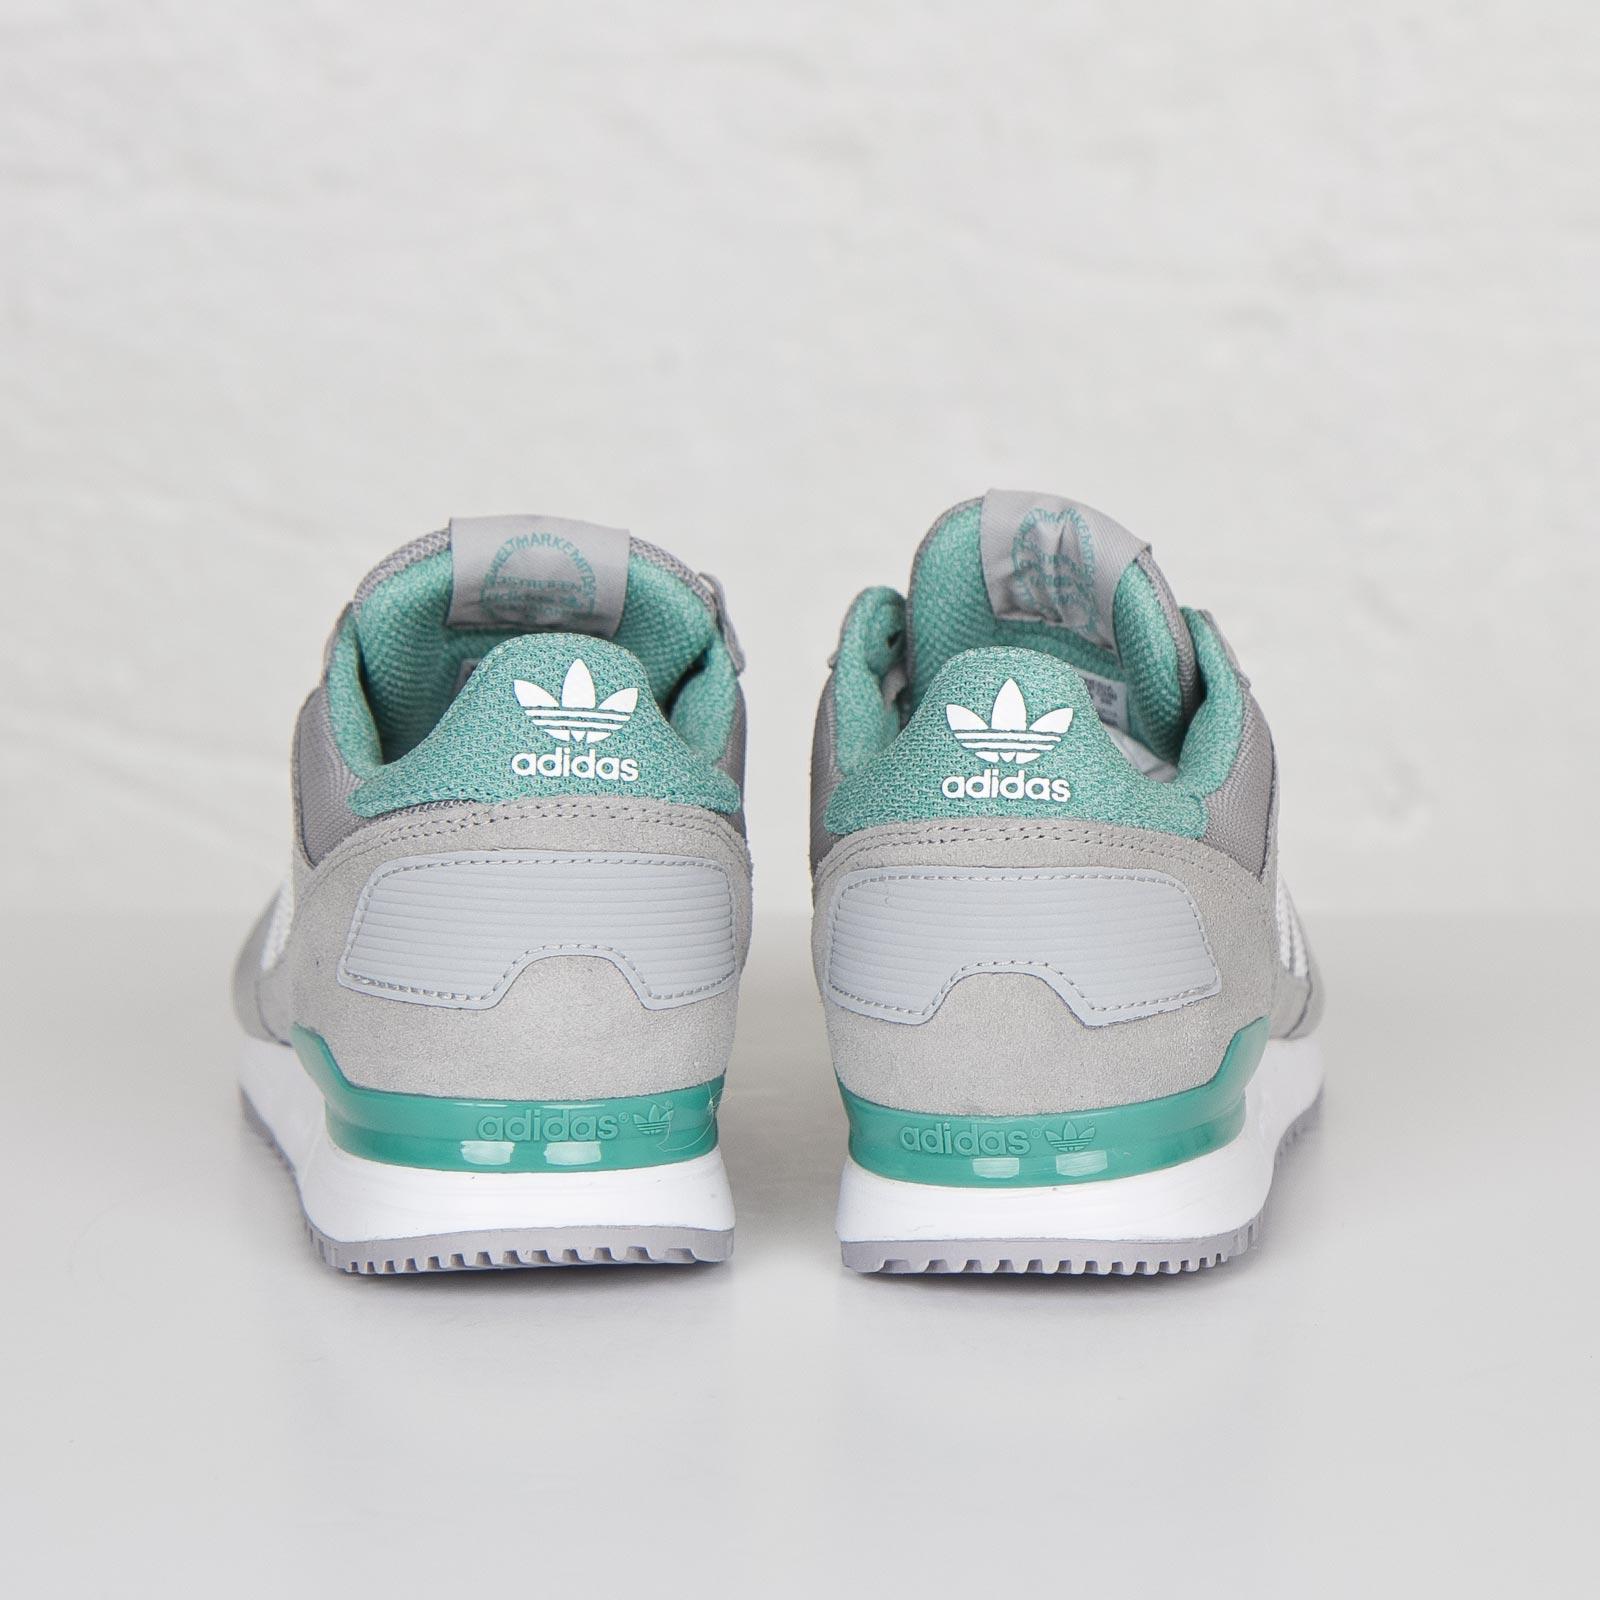 adidas ZX 700 W - M19415 - Sneakersnstuff | sneakers ...